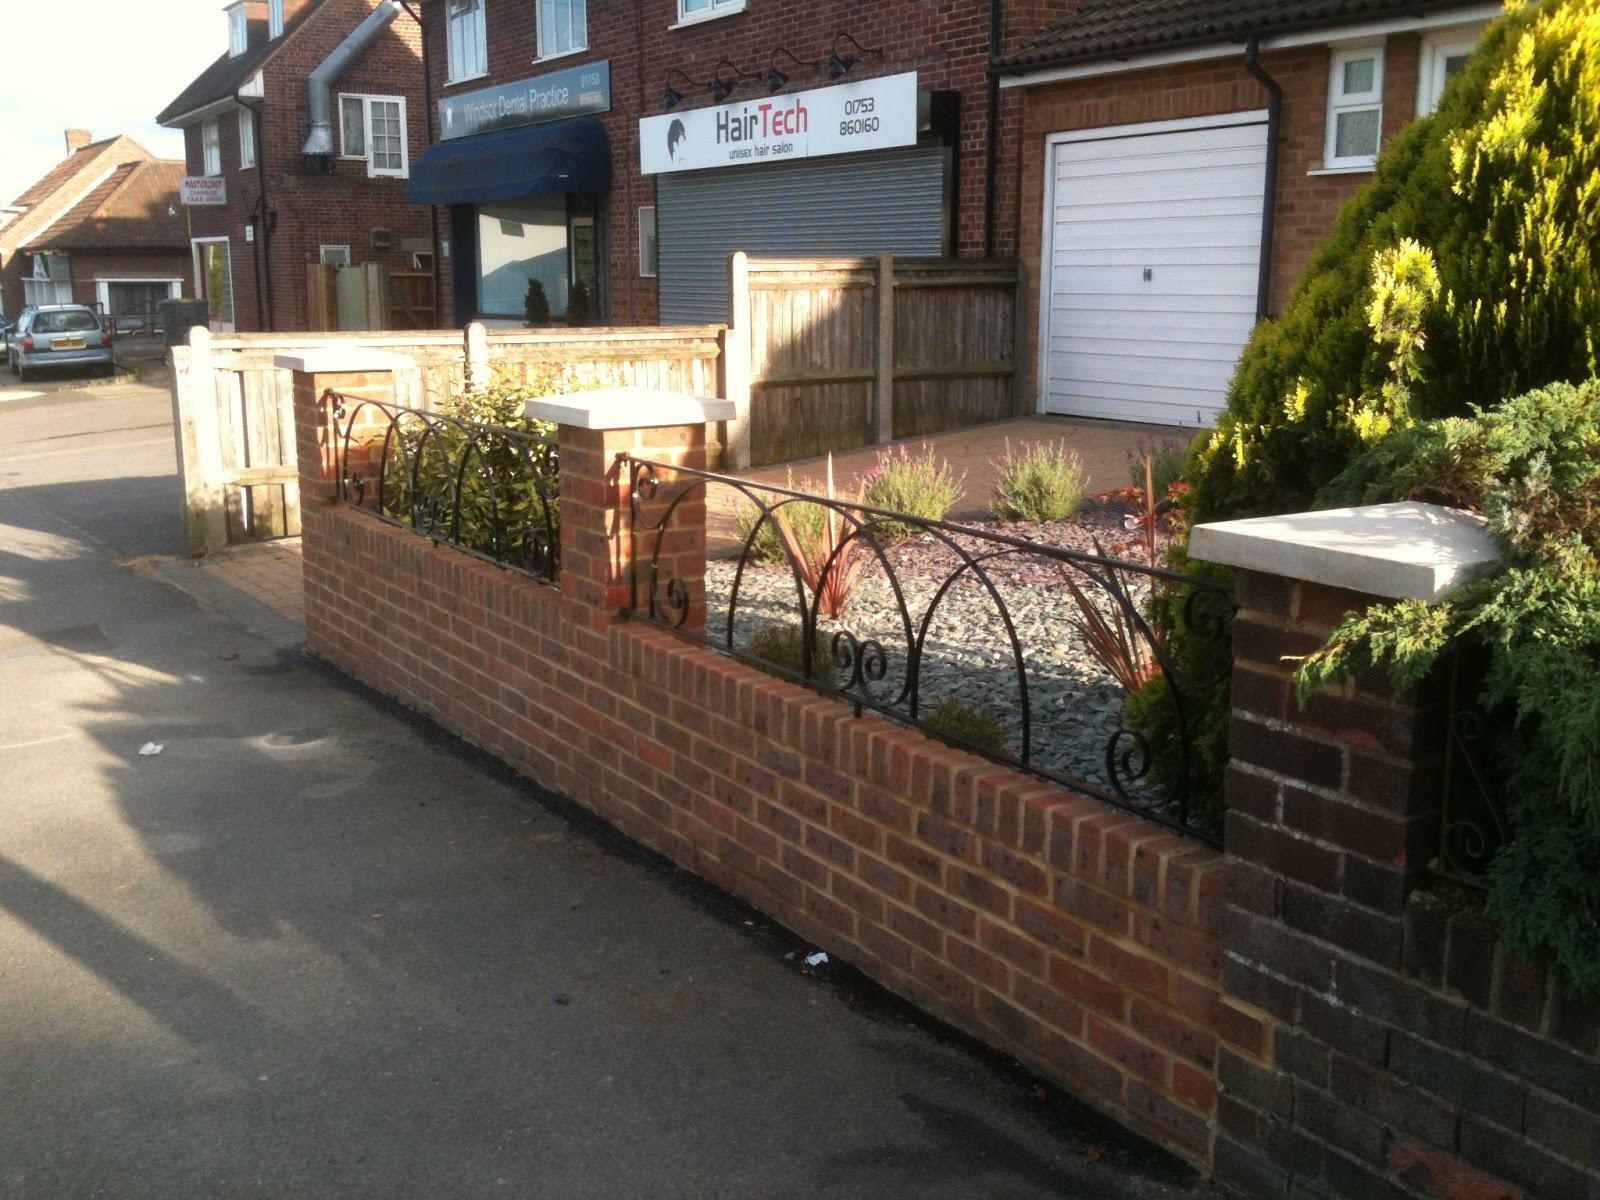 Goodger design associates news front garden for 97 clewer for Brick wall garden designs